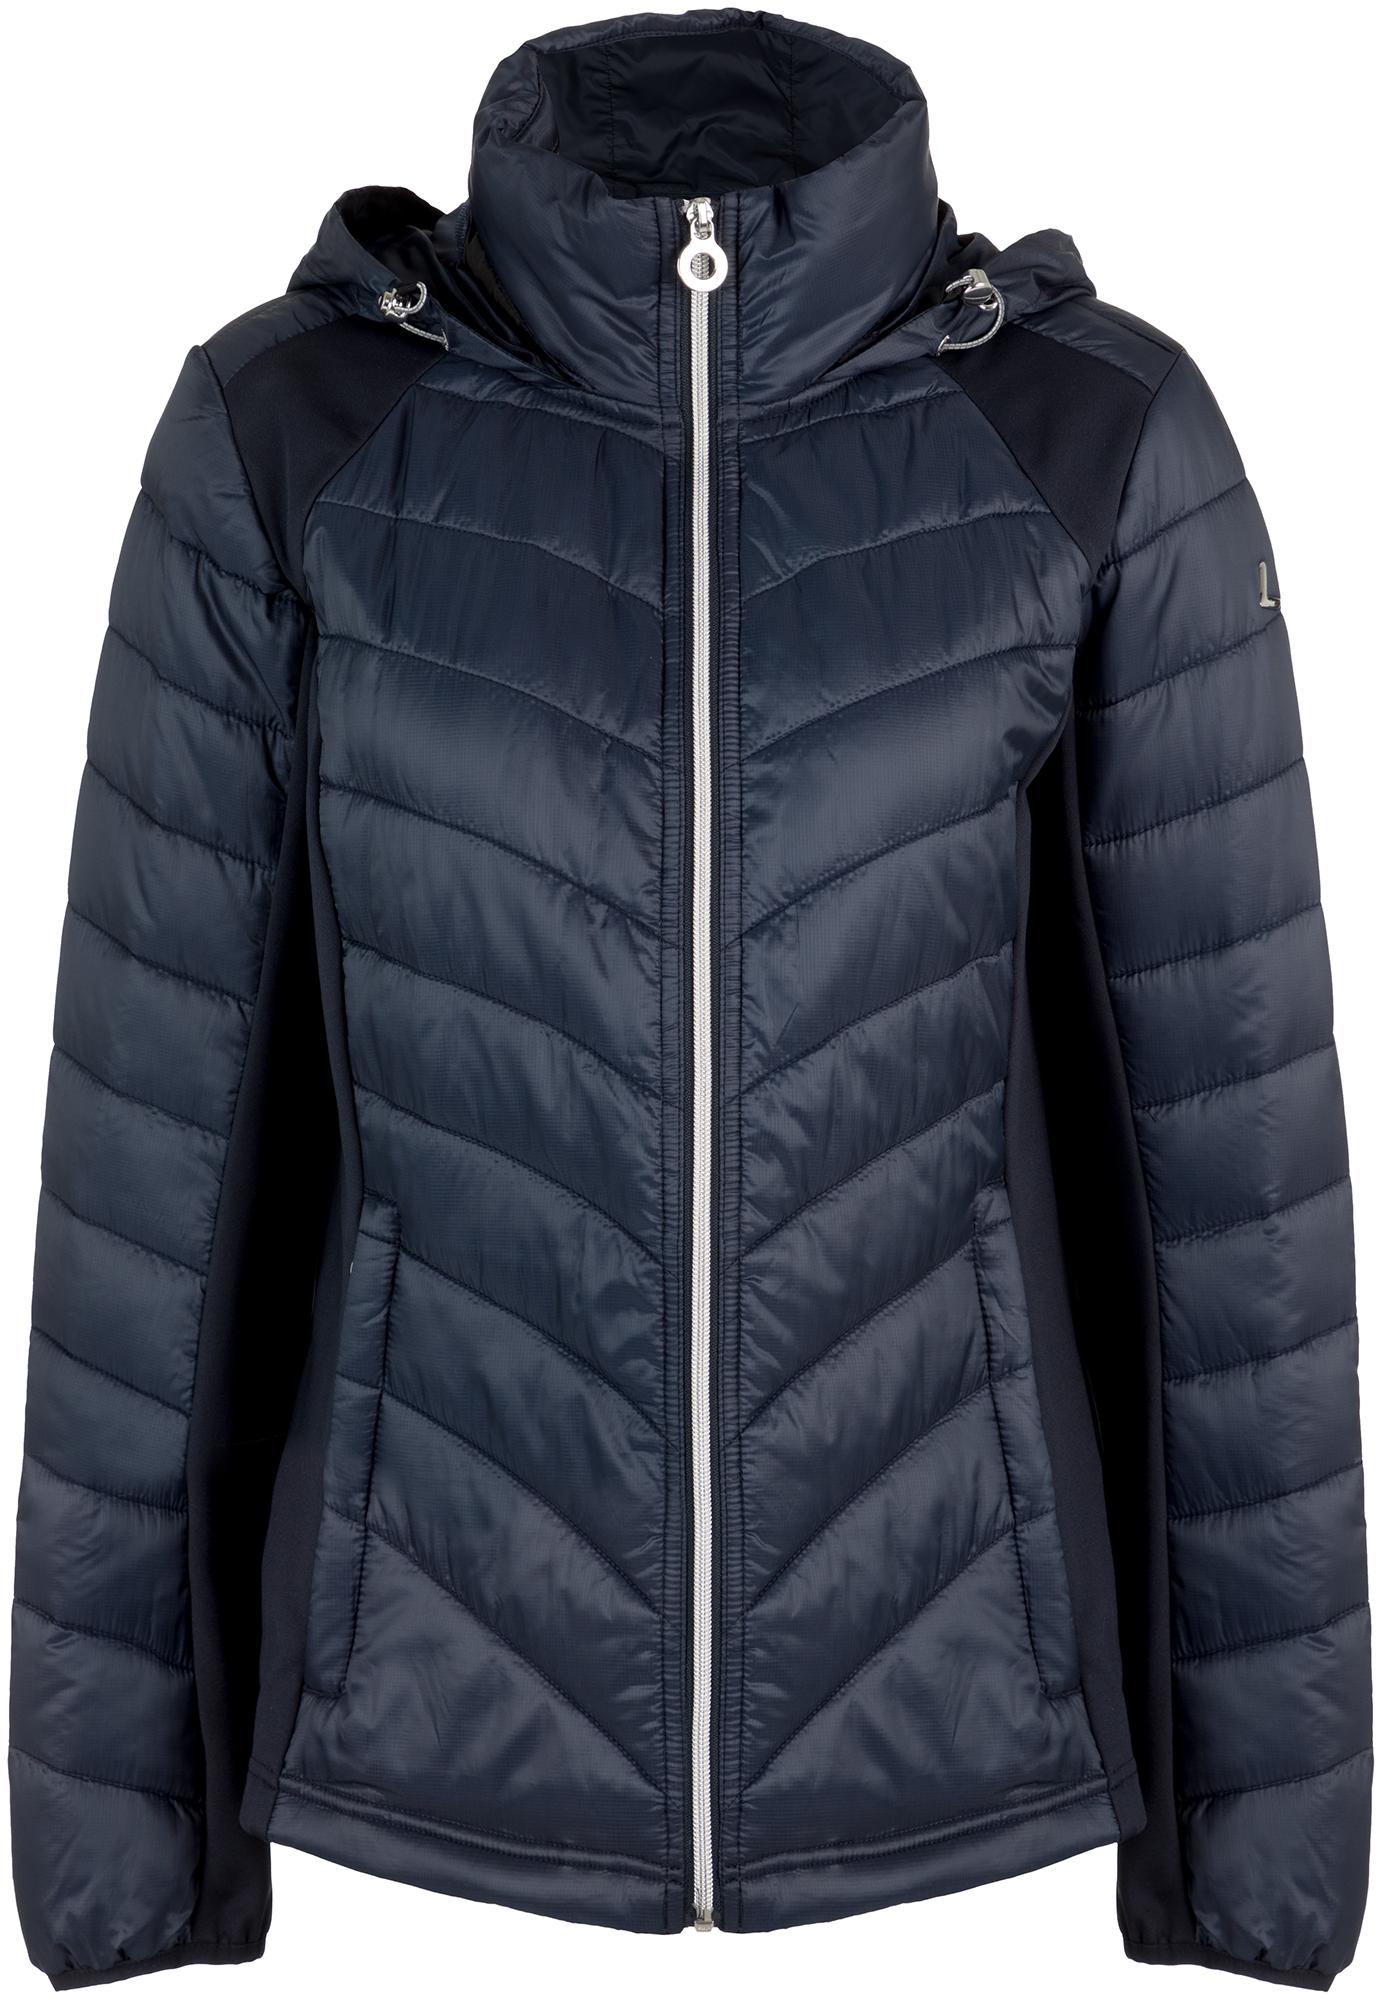 Luhta Куртка утепленная женская Luhta Hollstens, размер 52 куртка утепленная luhta luhta lu692ewcovk3